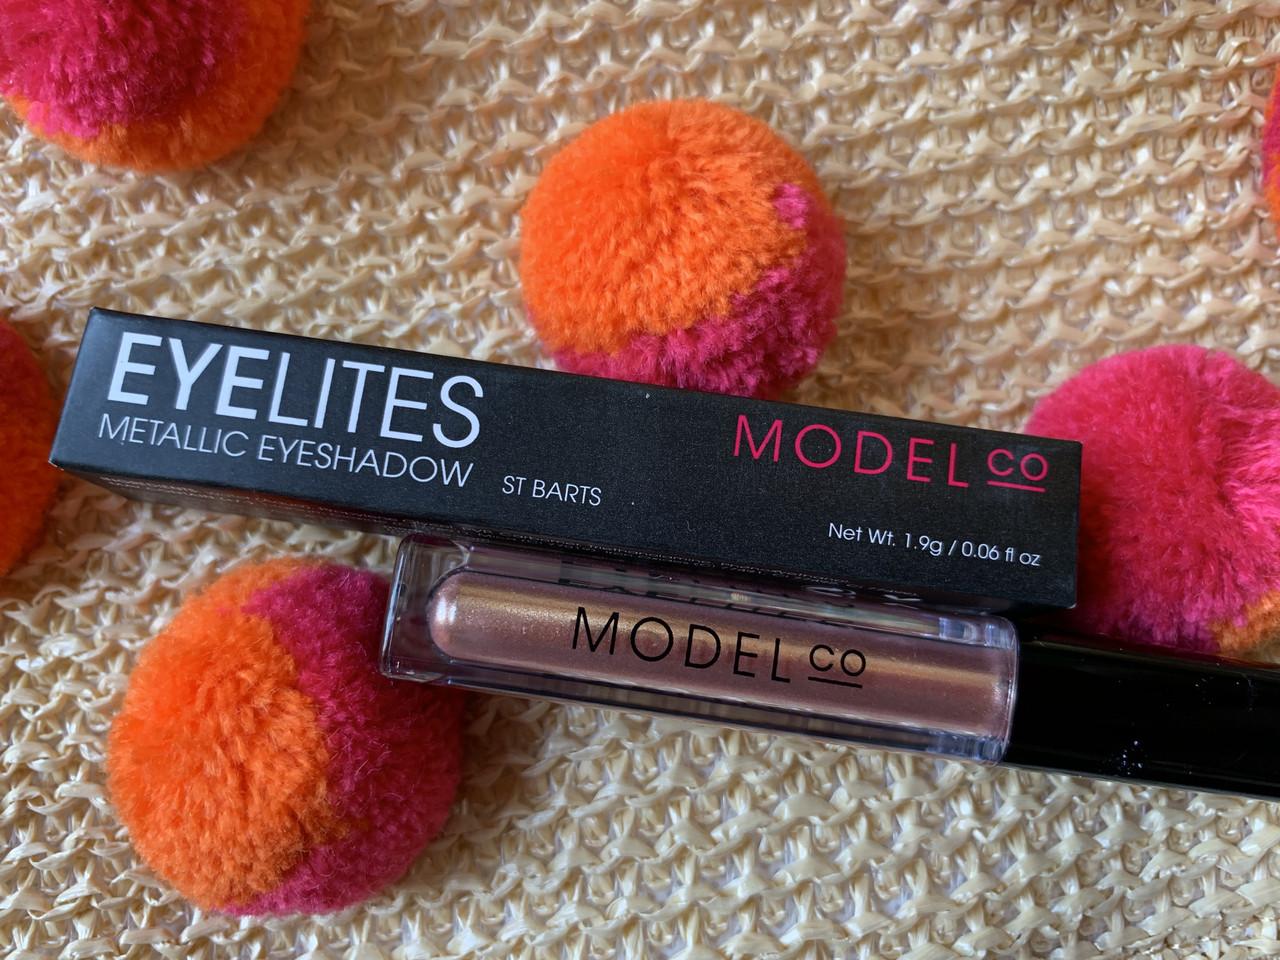 Жидкие тени-металлик для глаз MODEL CO Eyelites St. Barts